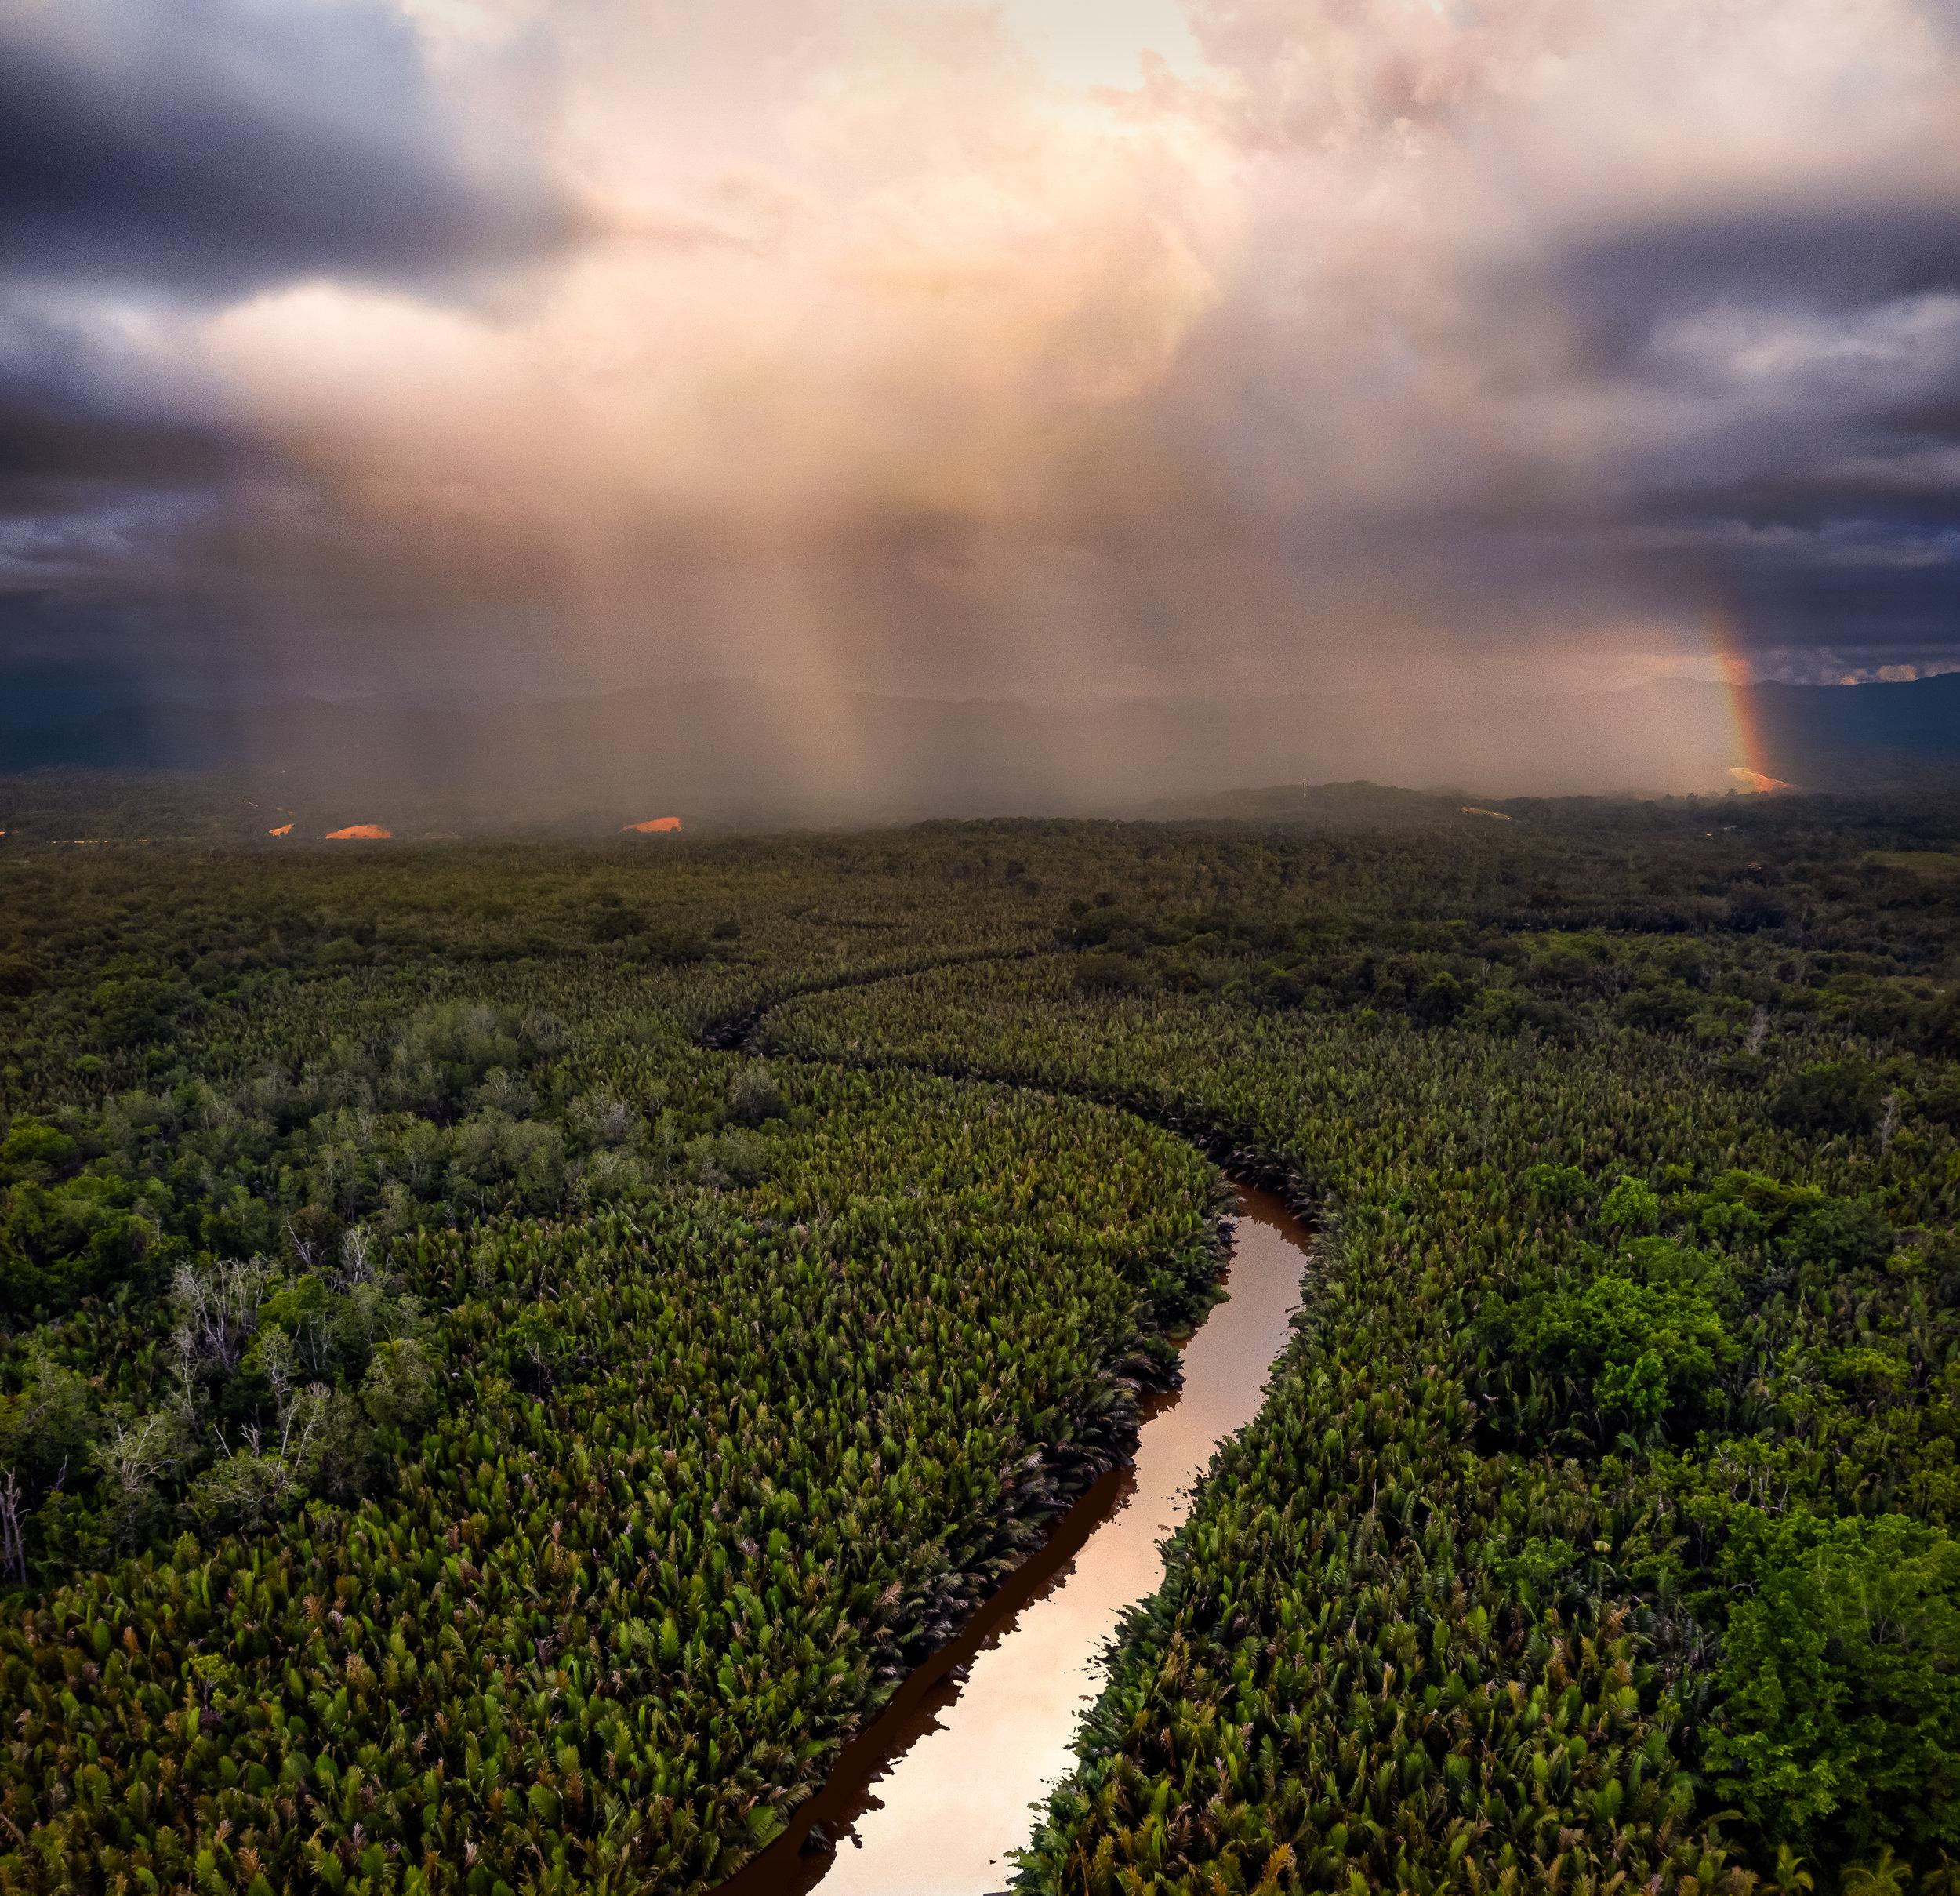 Rainbows, rainclouds, wetlands, rivers. Shot on the DJI Mavic 2 Pro, by Joshua Karthik.